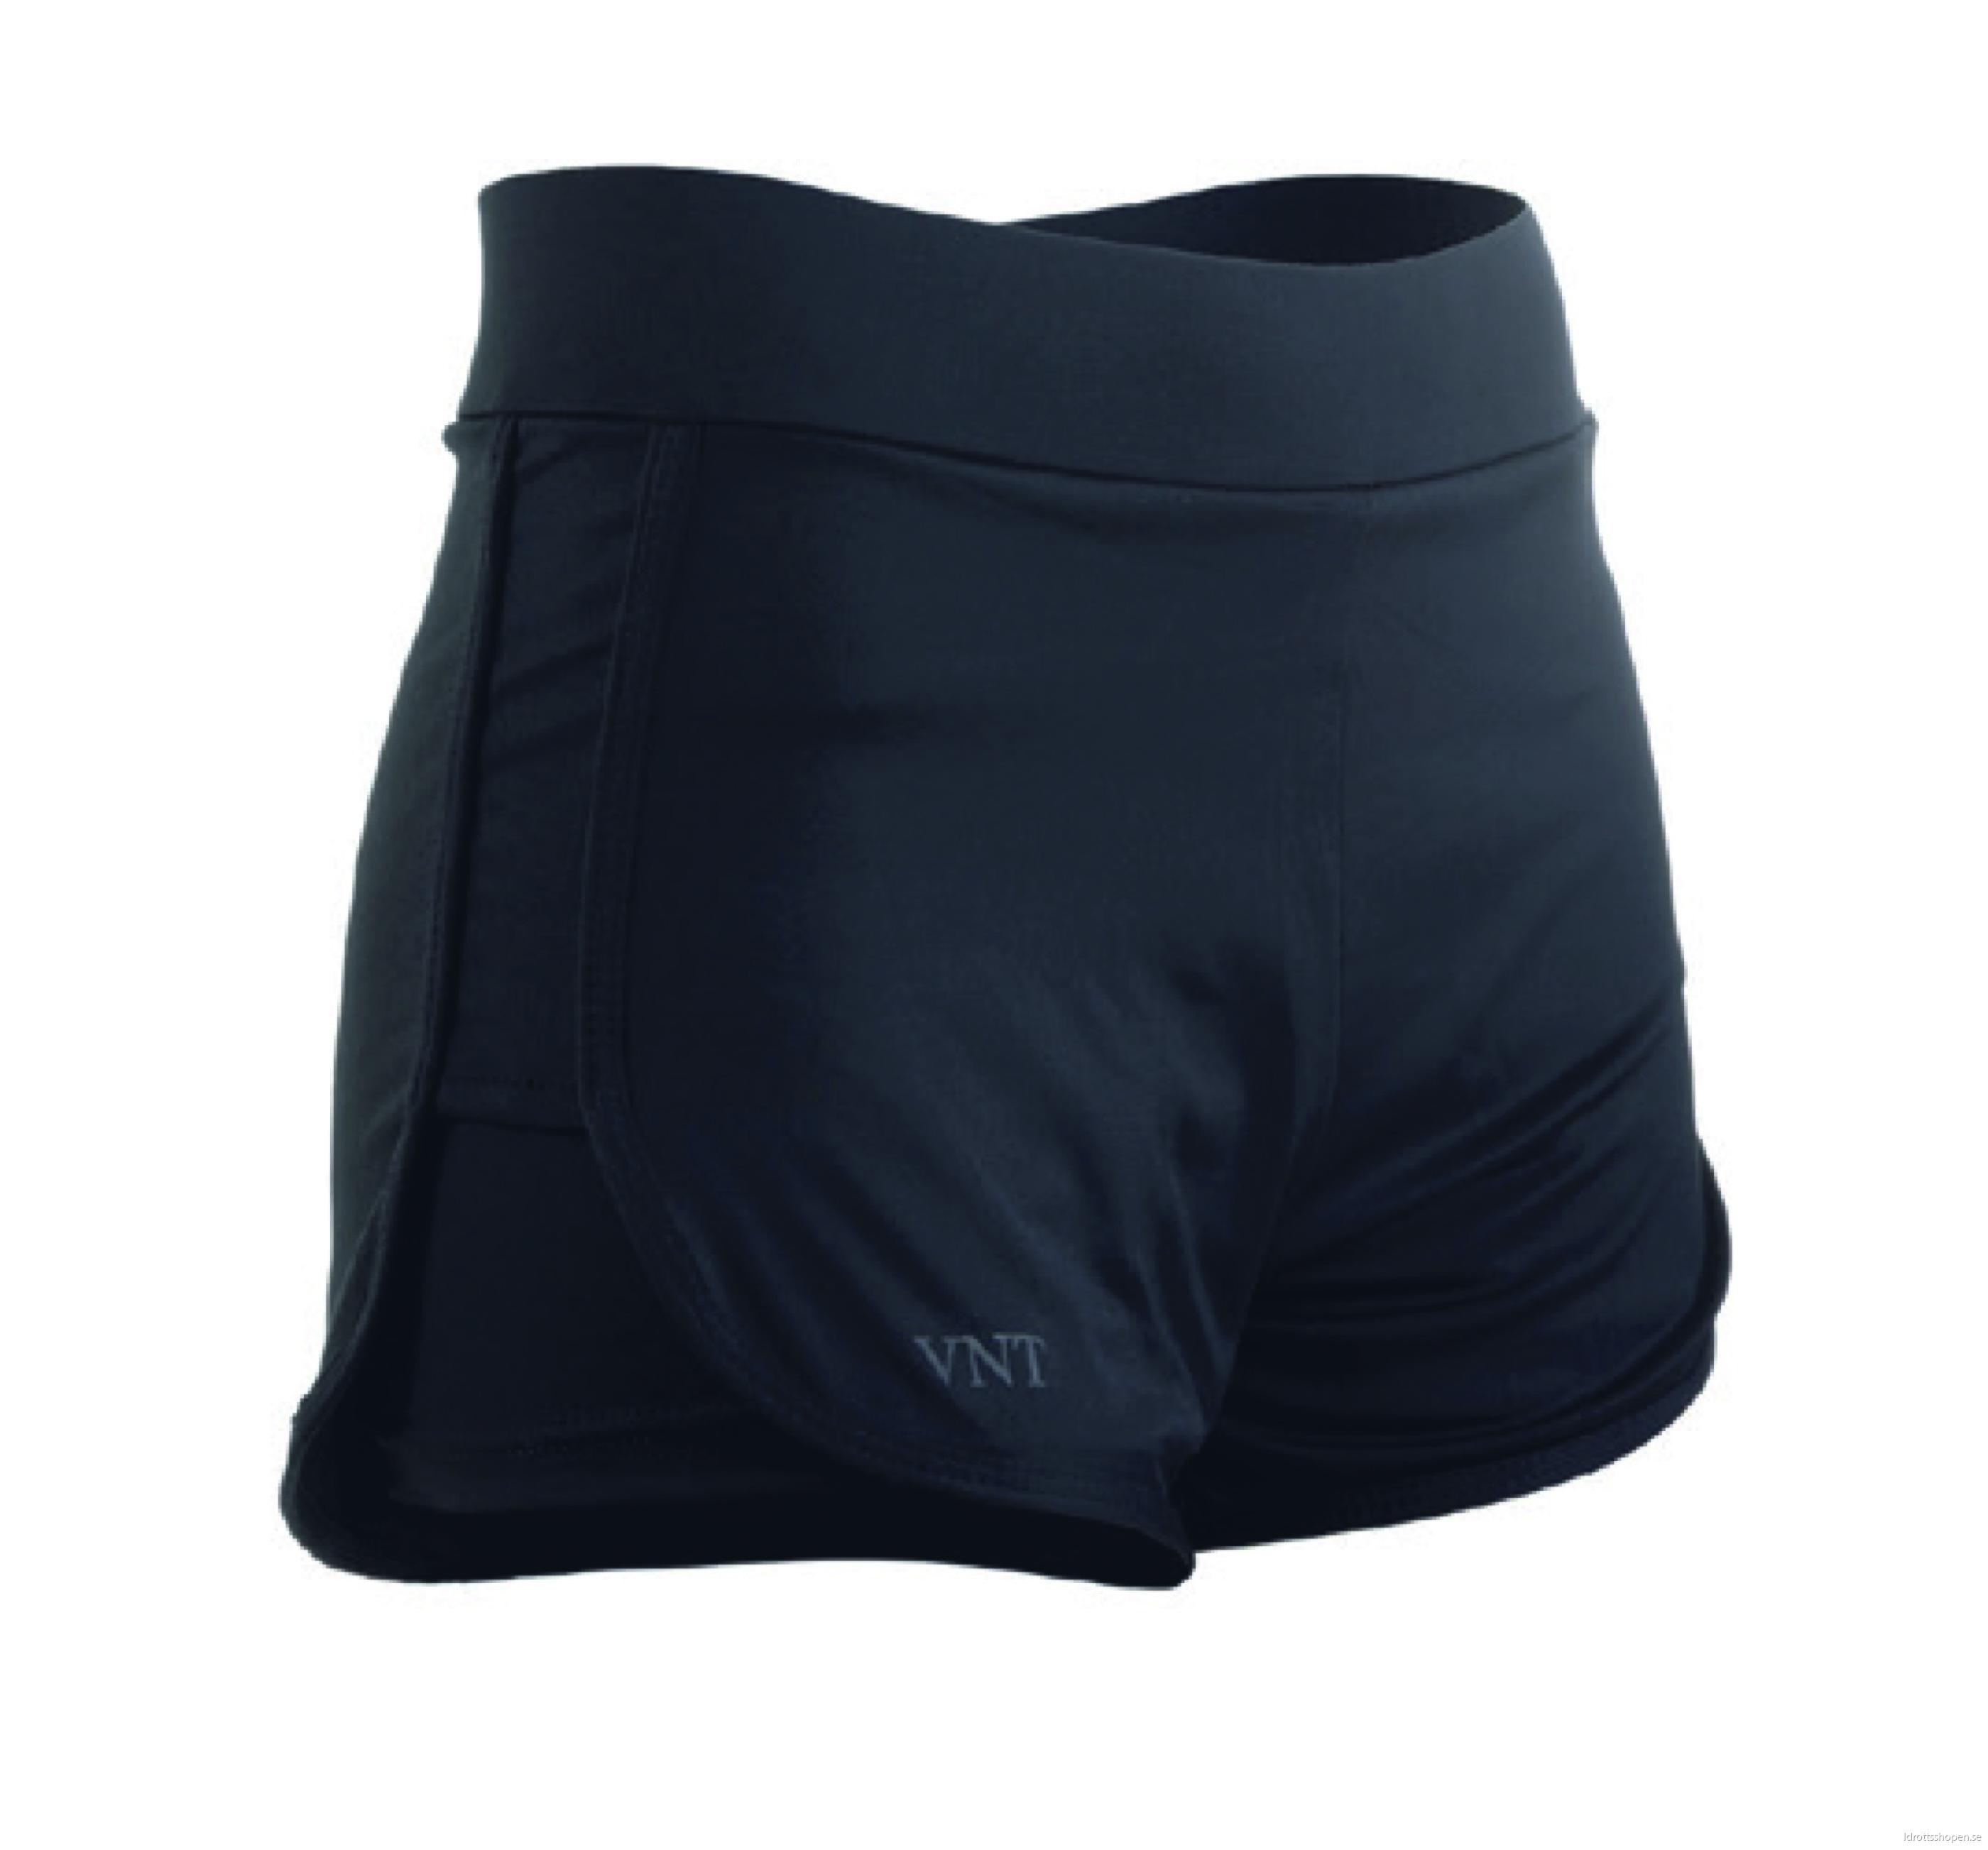 Venturelli shorts black 2